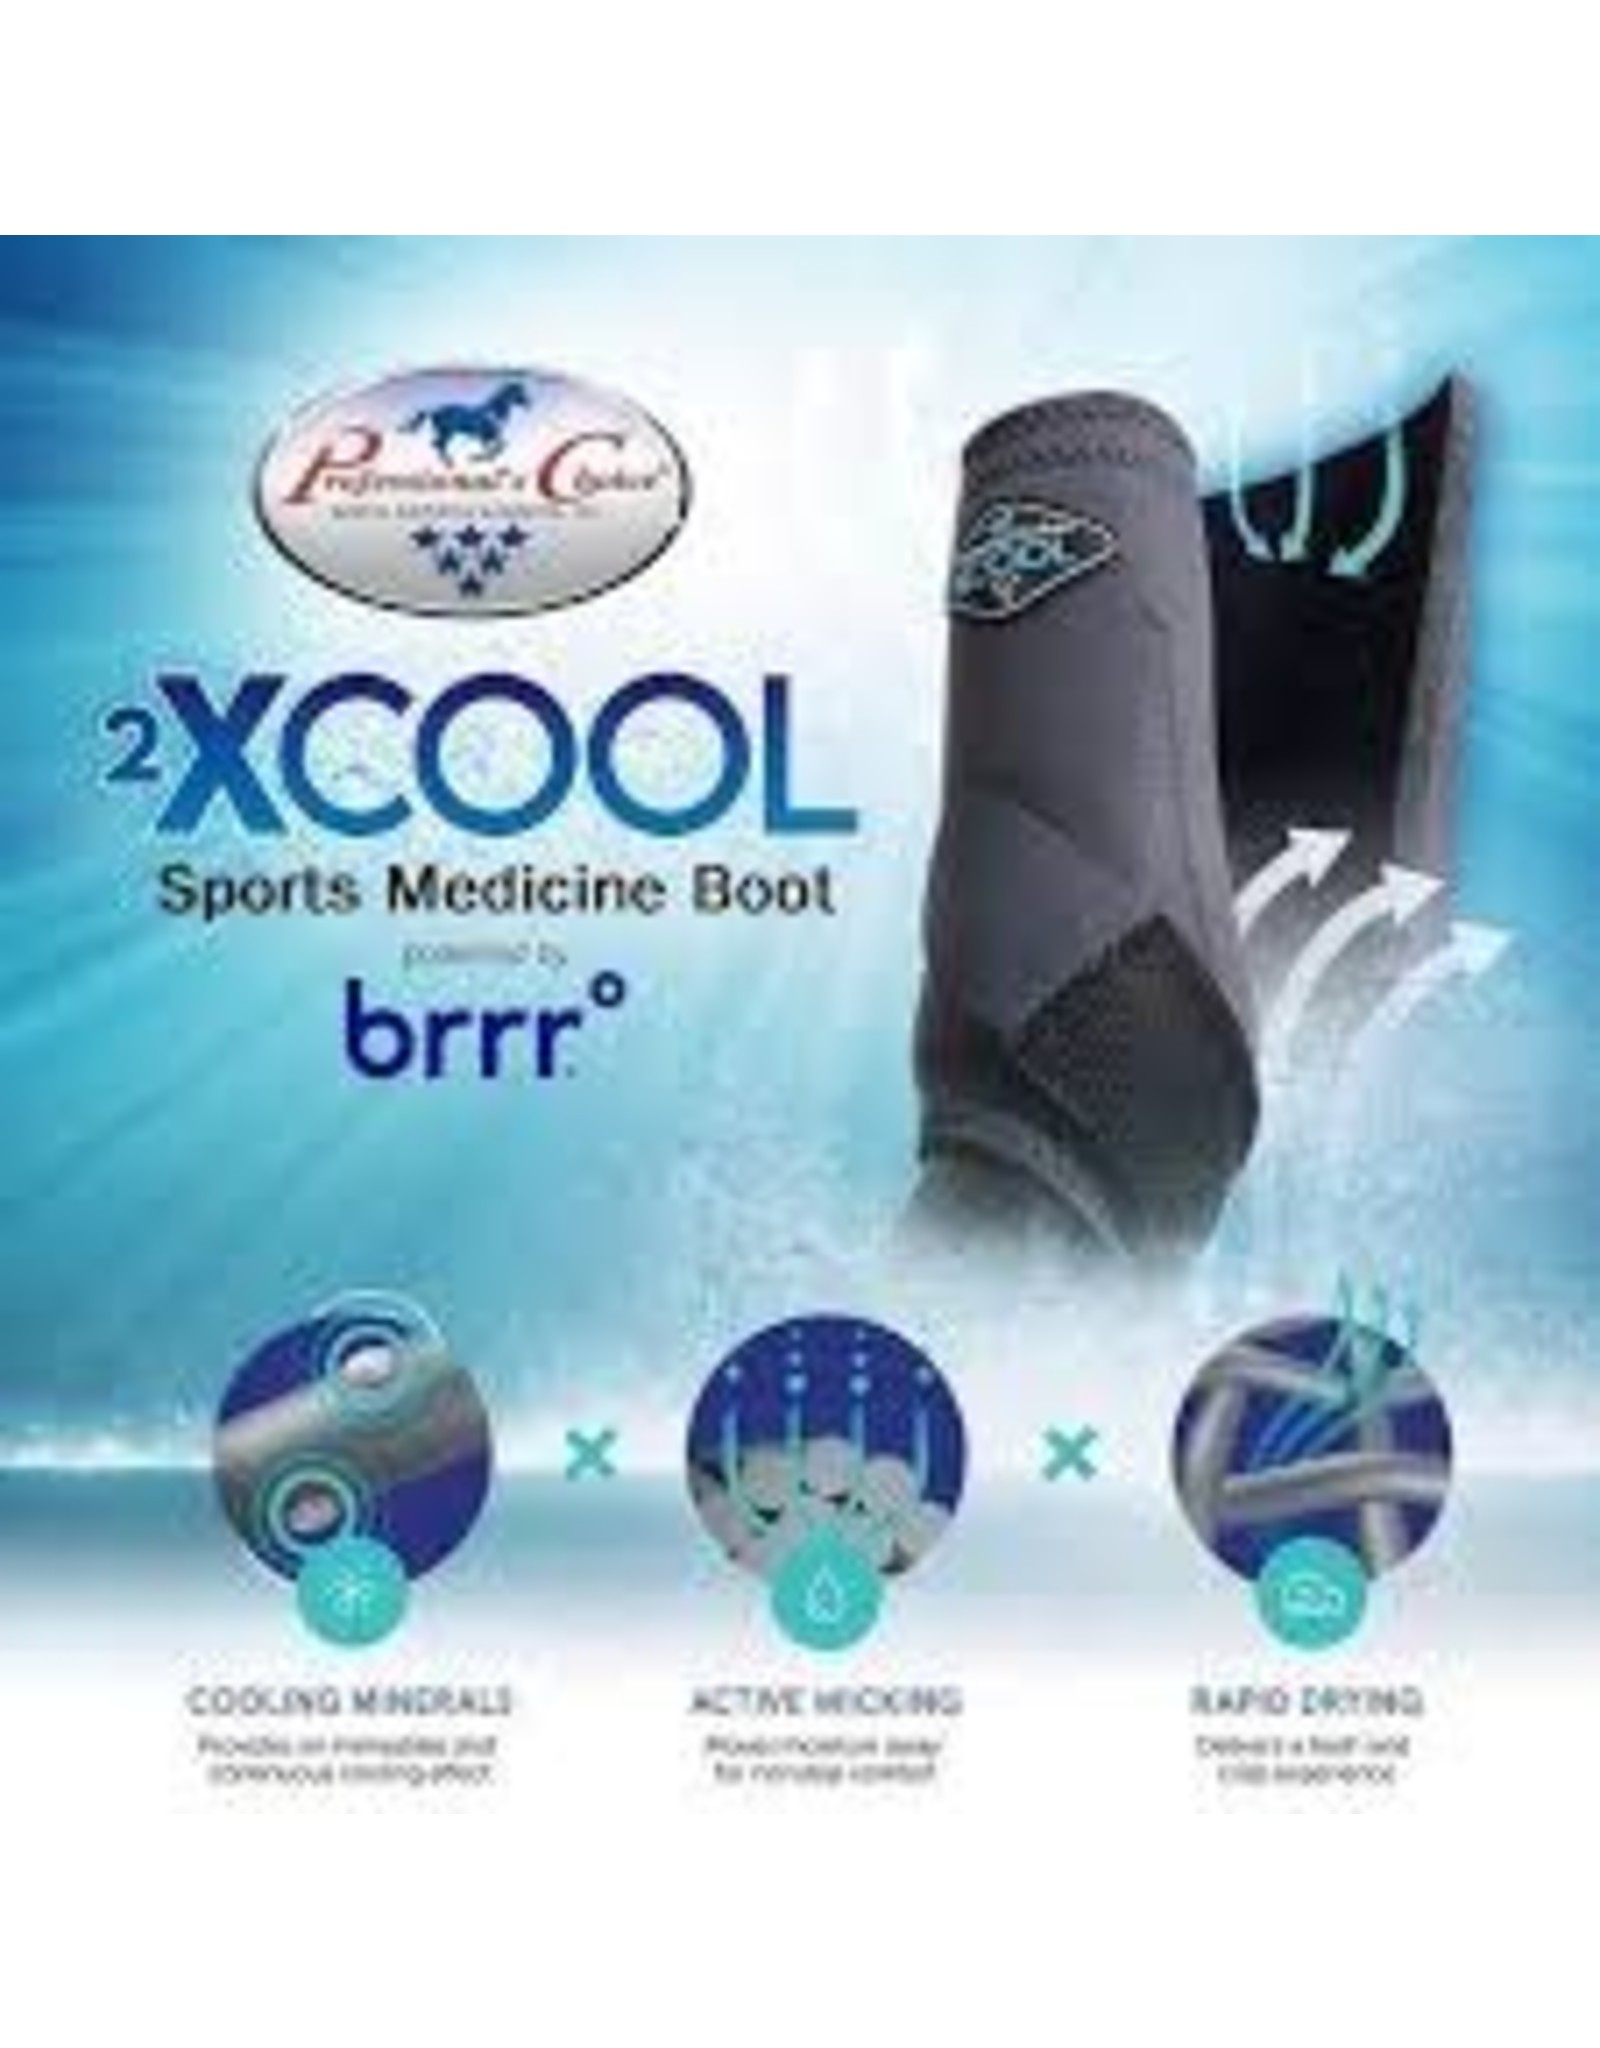 2XCOOL - Sports Medicine Boots - Purple- *pack of 4*  Large - #XC4L-Purple